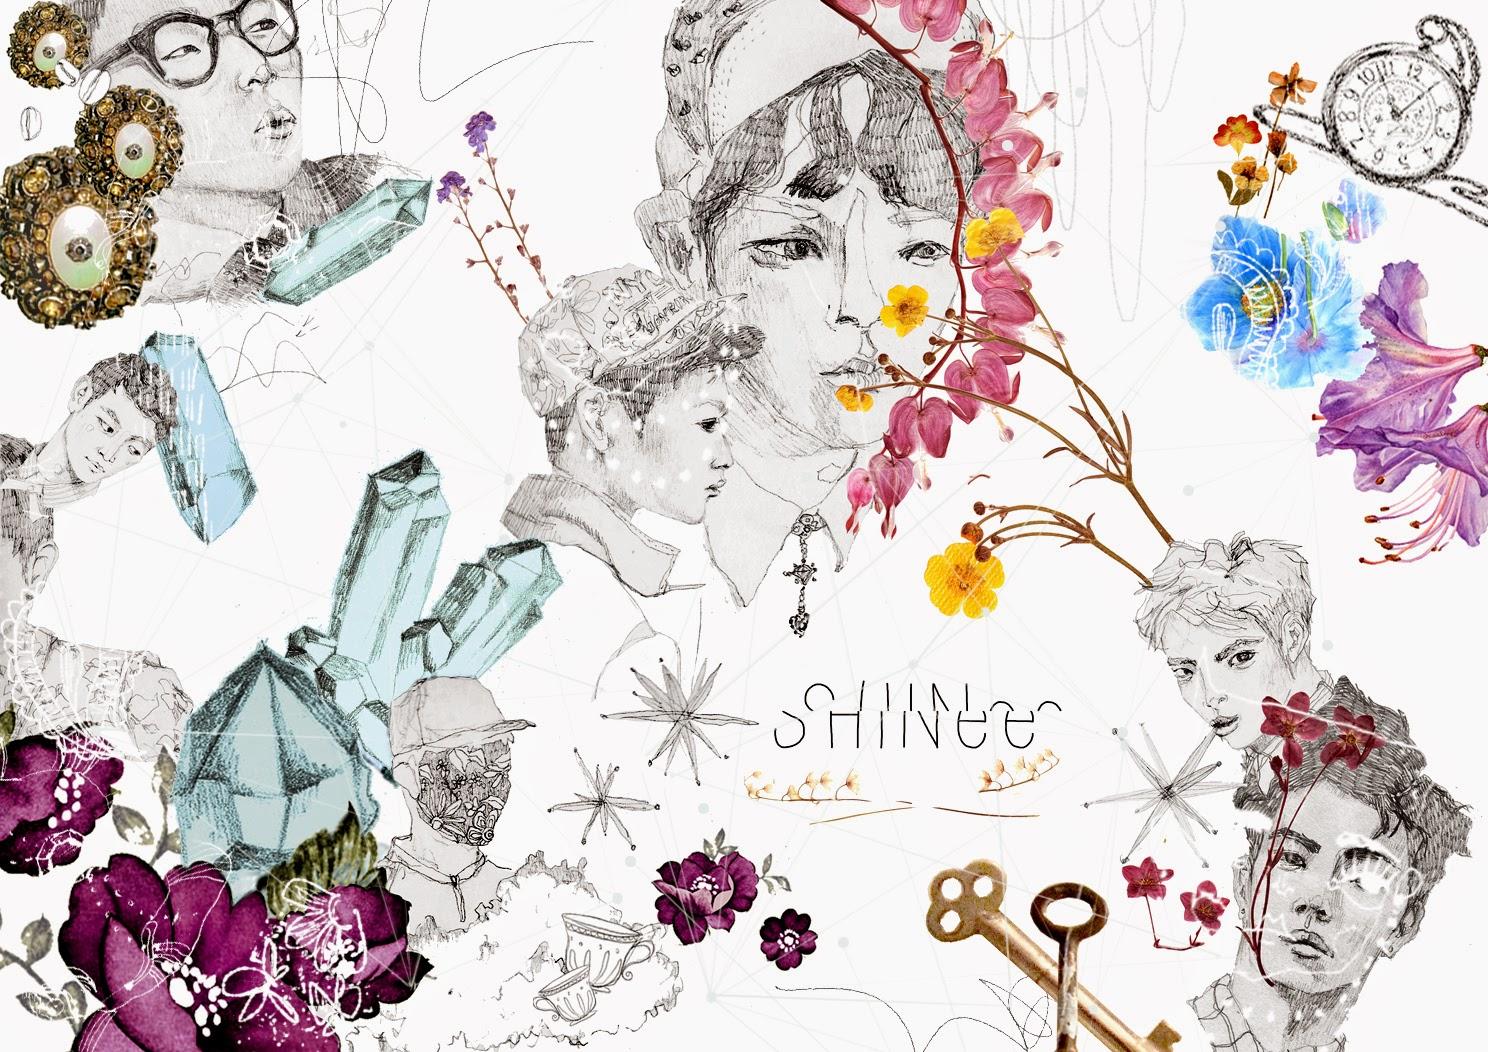 SHINee+poster.jpg